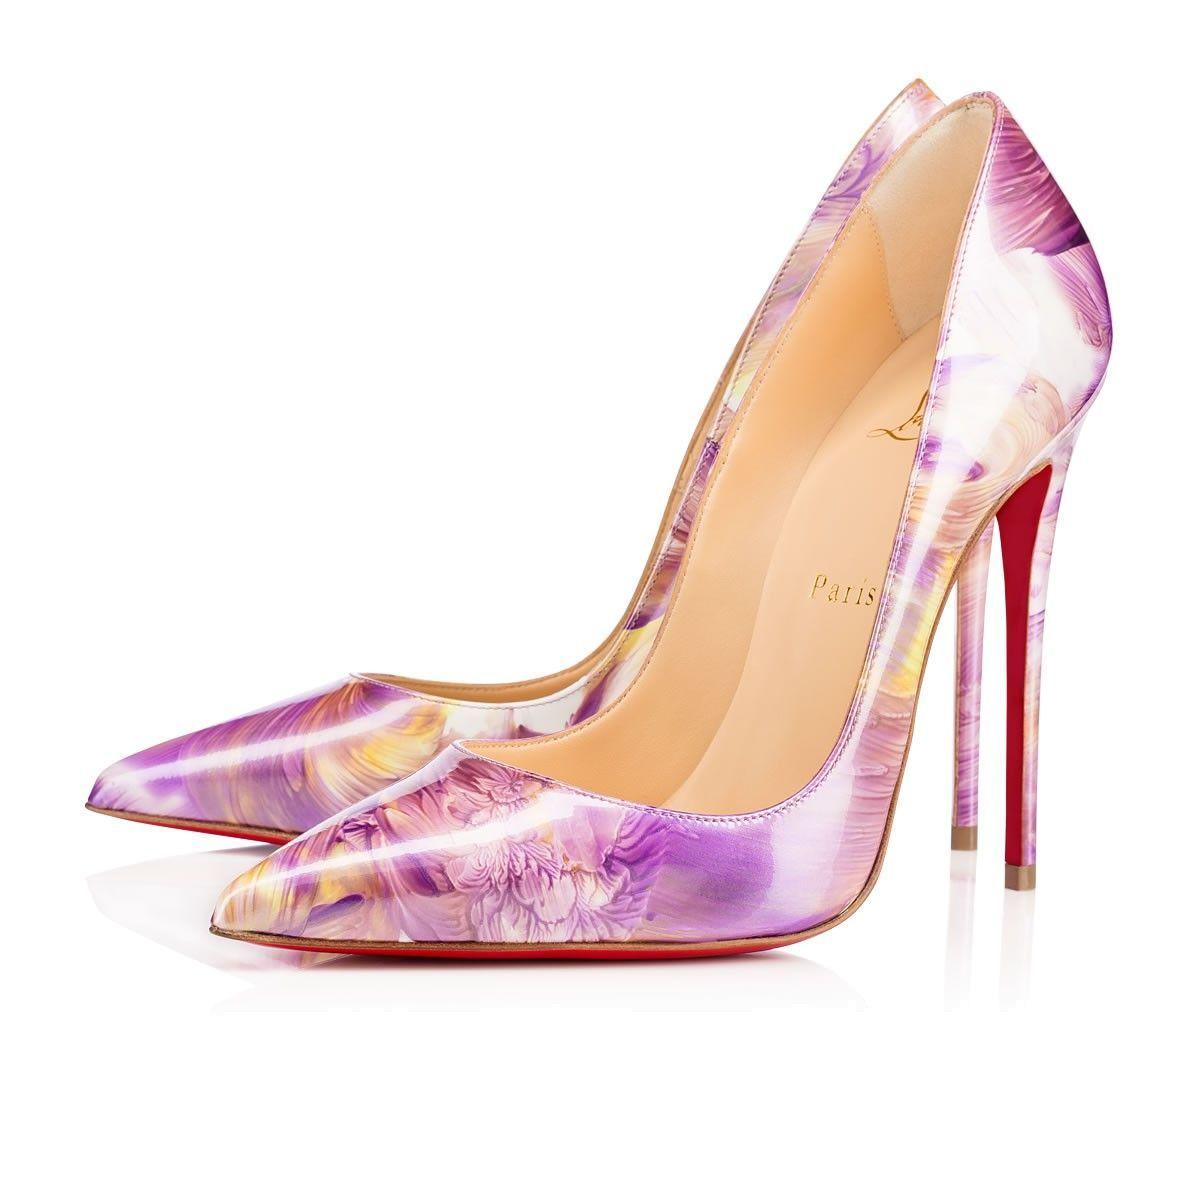 90c94815bc7c Shoes - So Kate - Christian Louboutin